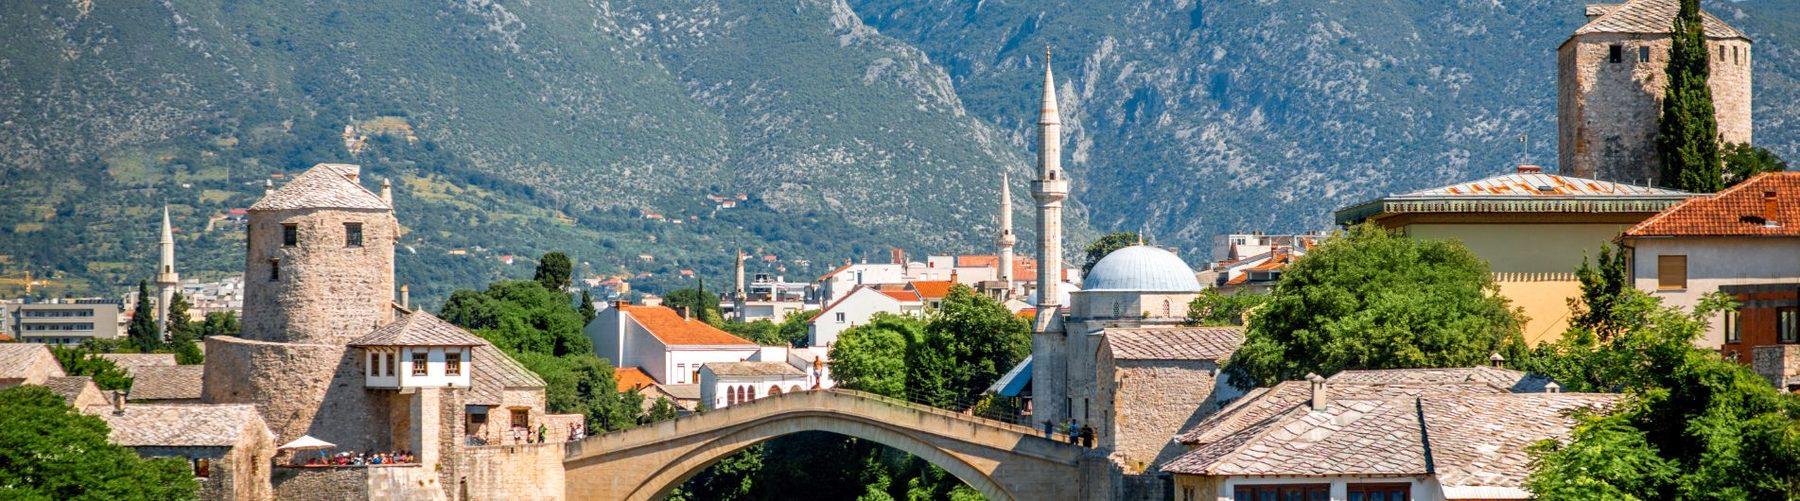 Mostar City, Bosnia & Herzegovina